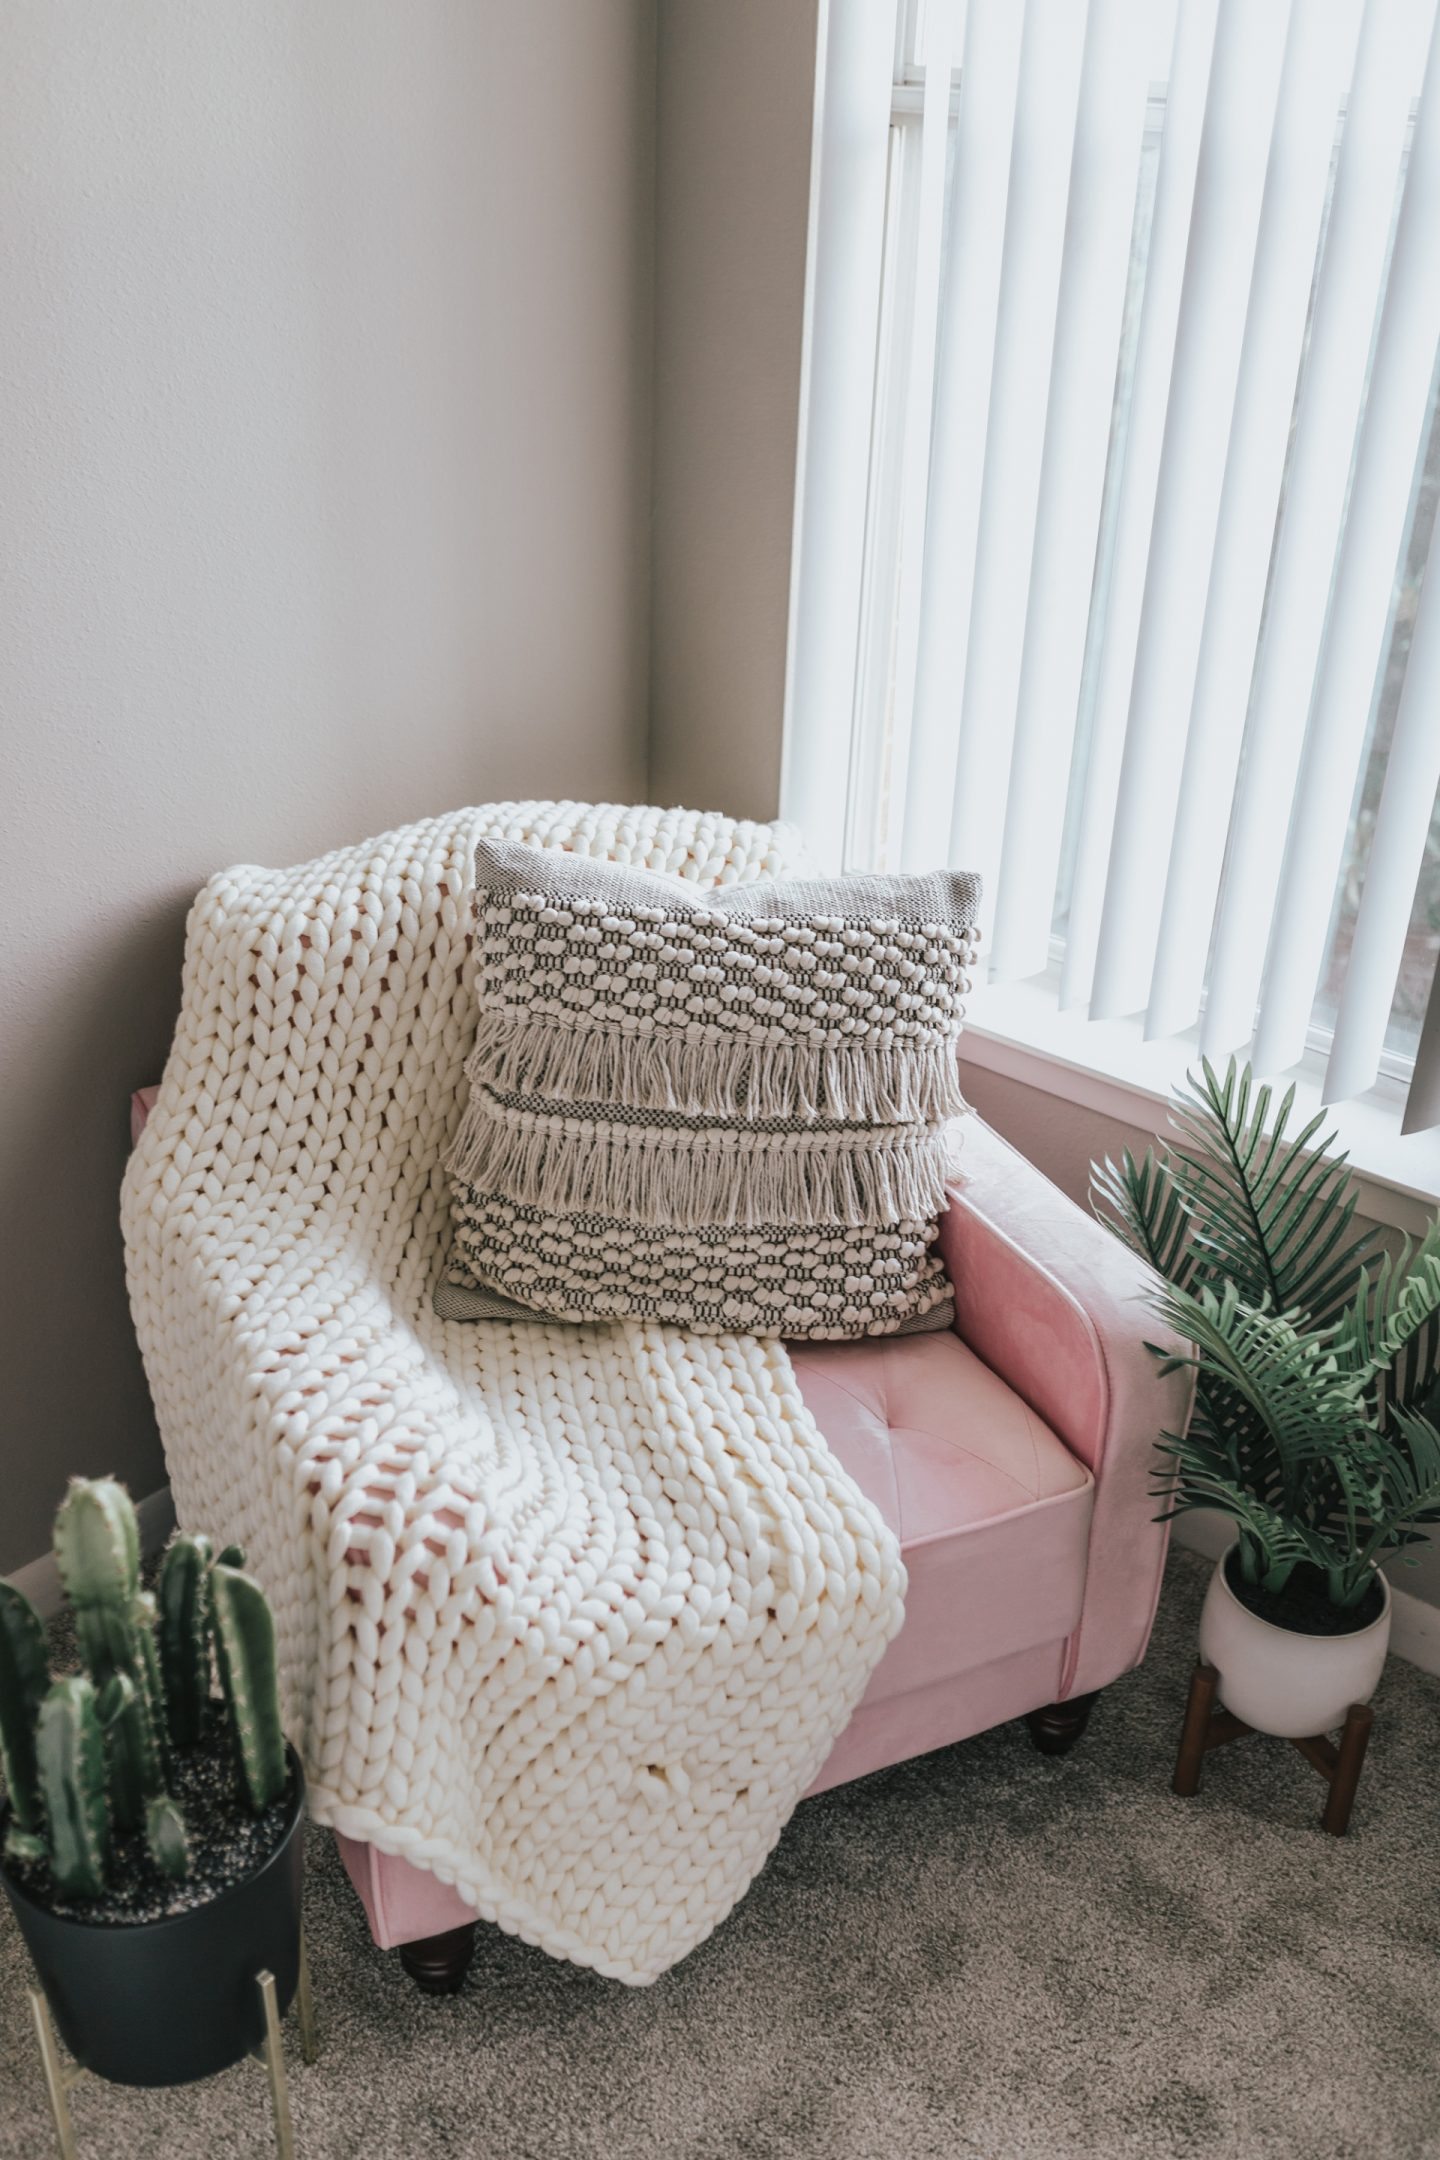 Under $200 Vintage Tufted Velvet Pink Accent Chair